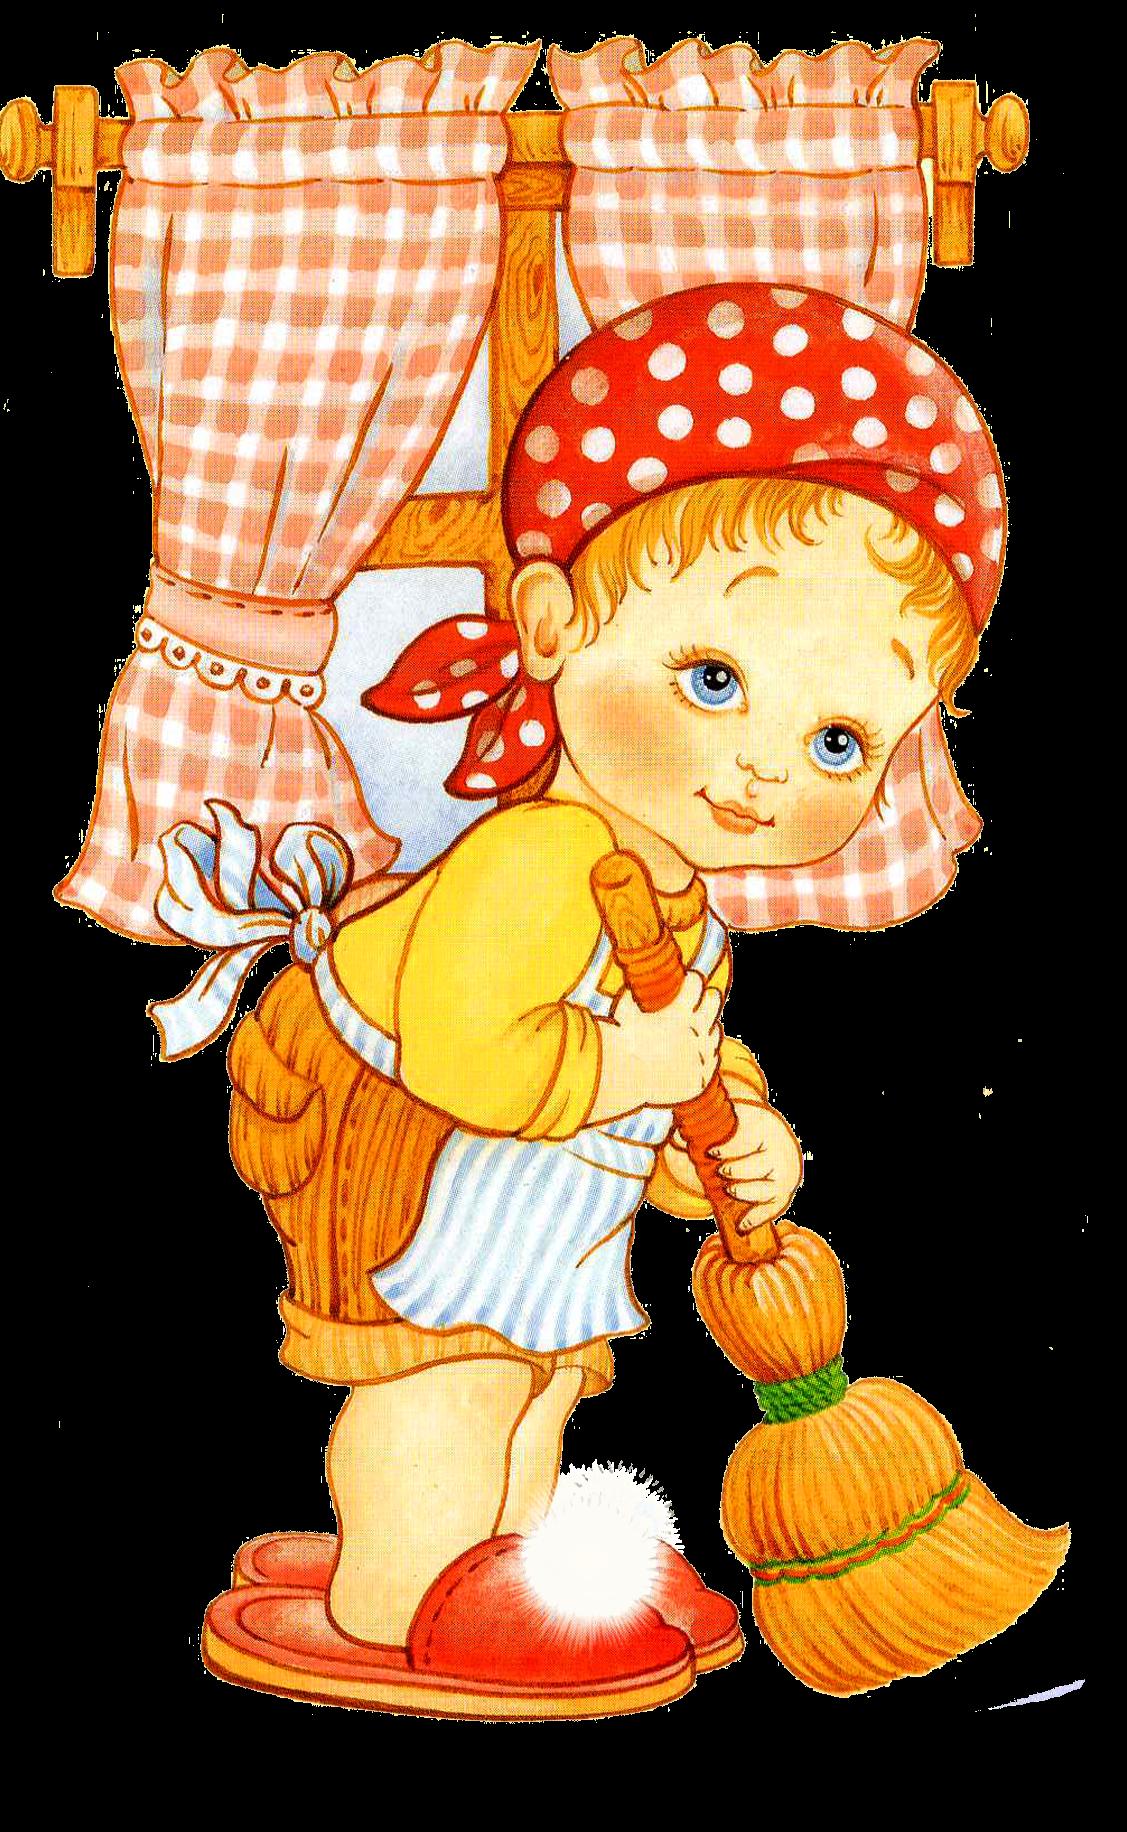 Sparkling clean house clipart clipart free library Рисунок девочки с метлой, уборка | BARNBILDER 2 | Pinterest ... clipart free library